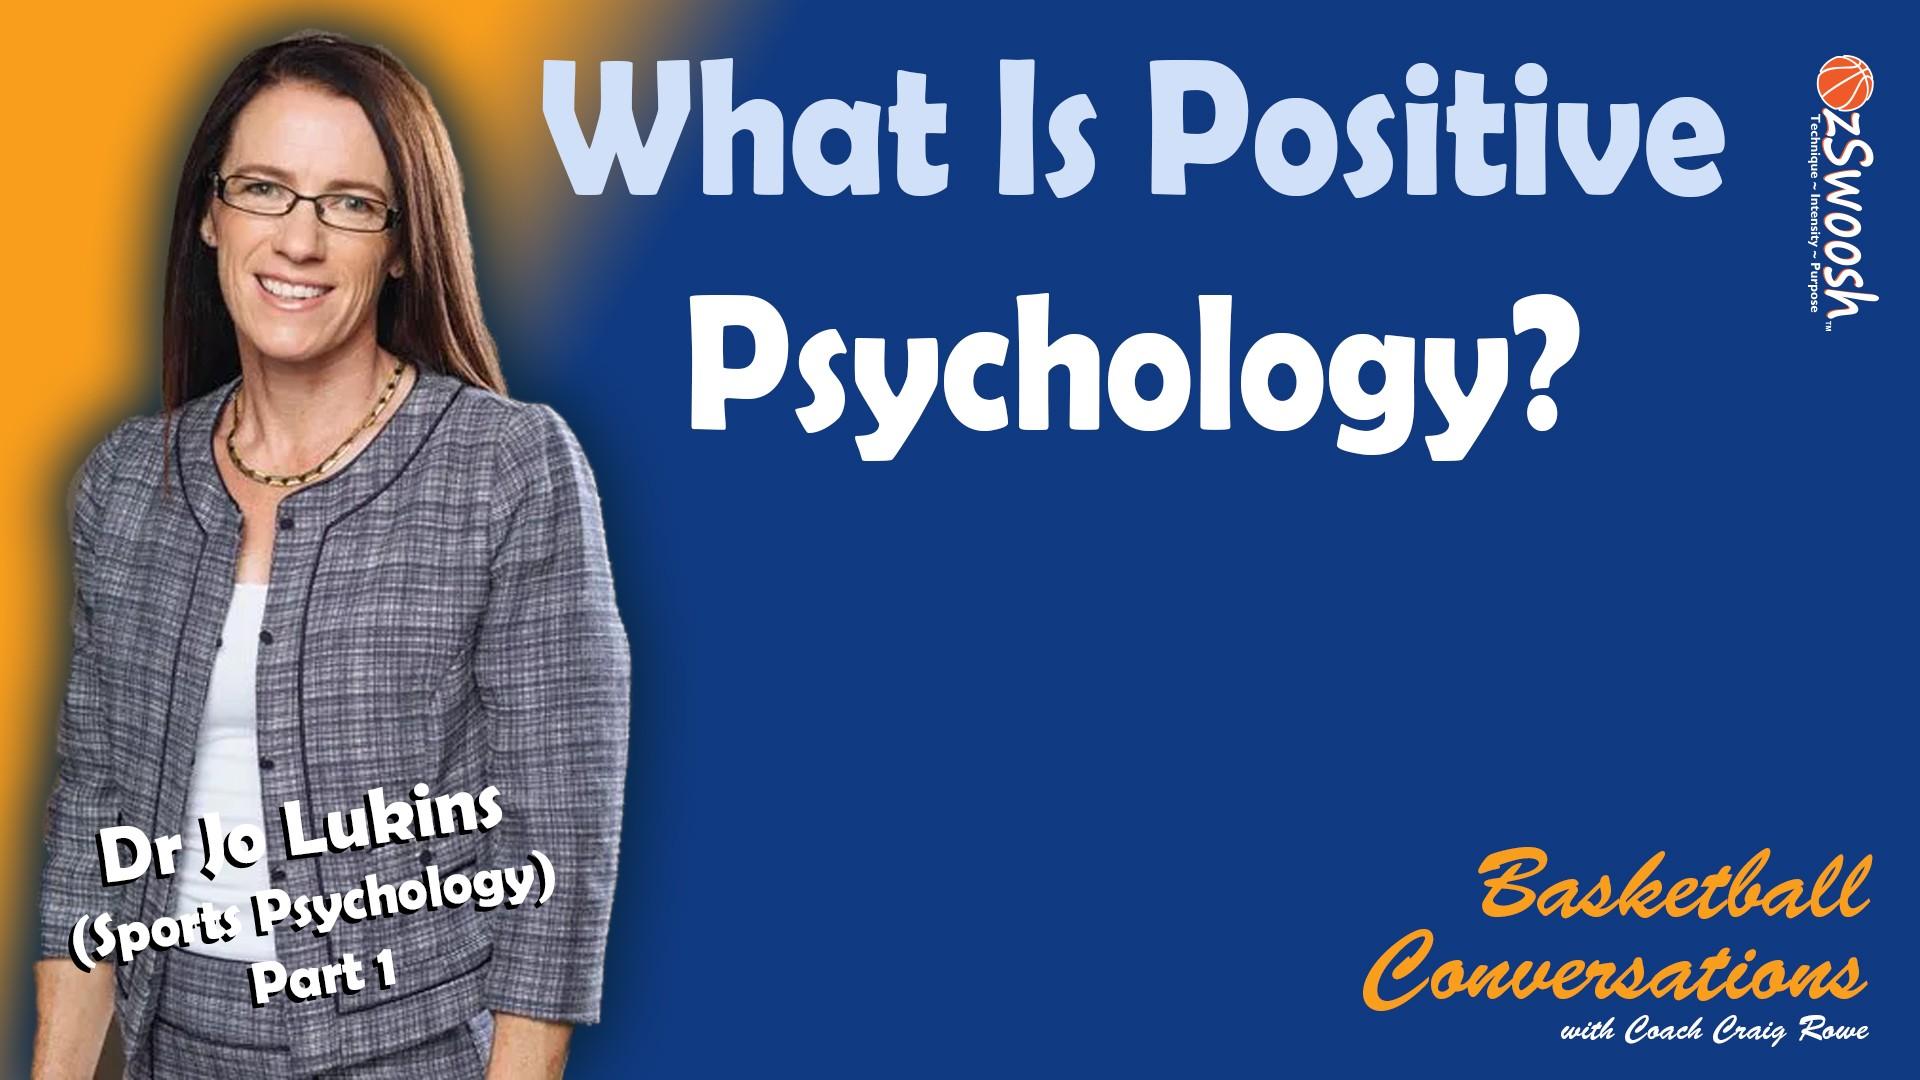 What is Positive Psychology - Dr Jo Lukins (Pt 1)